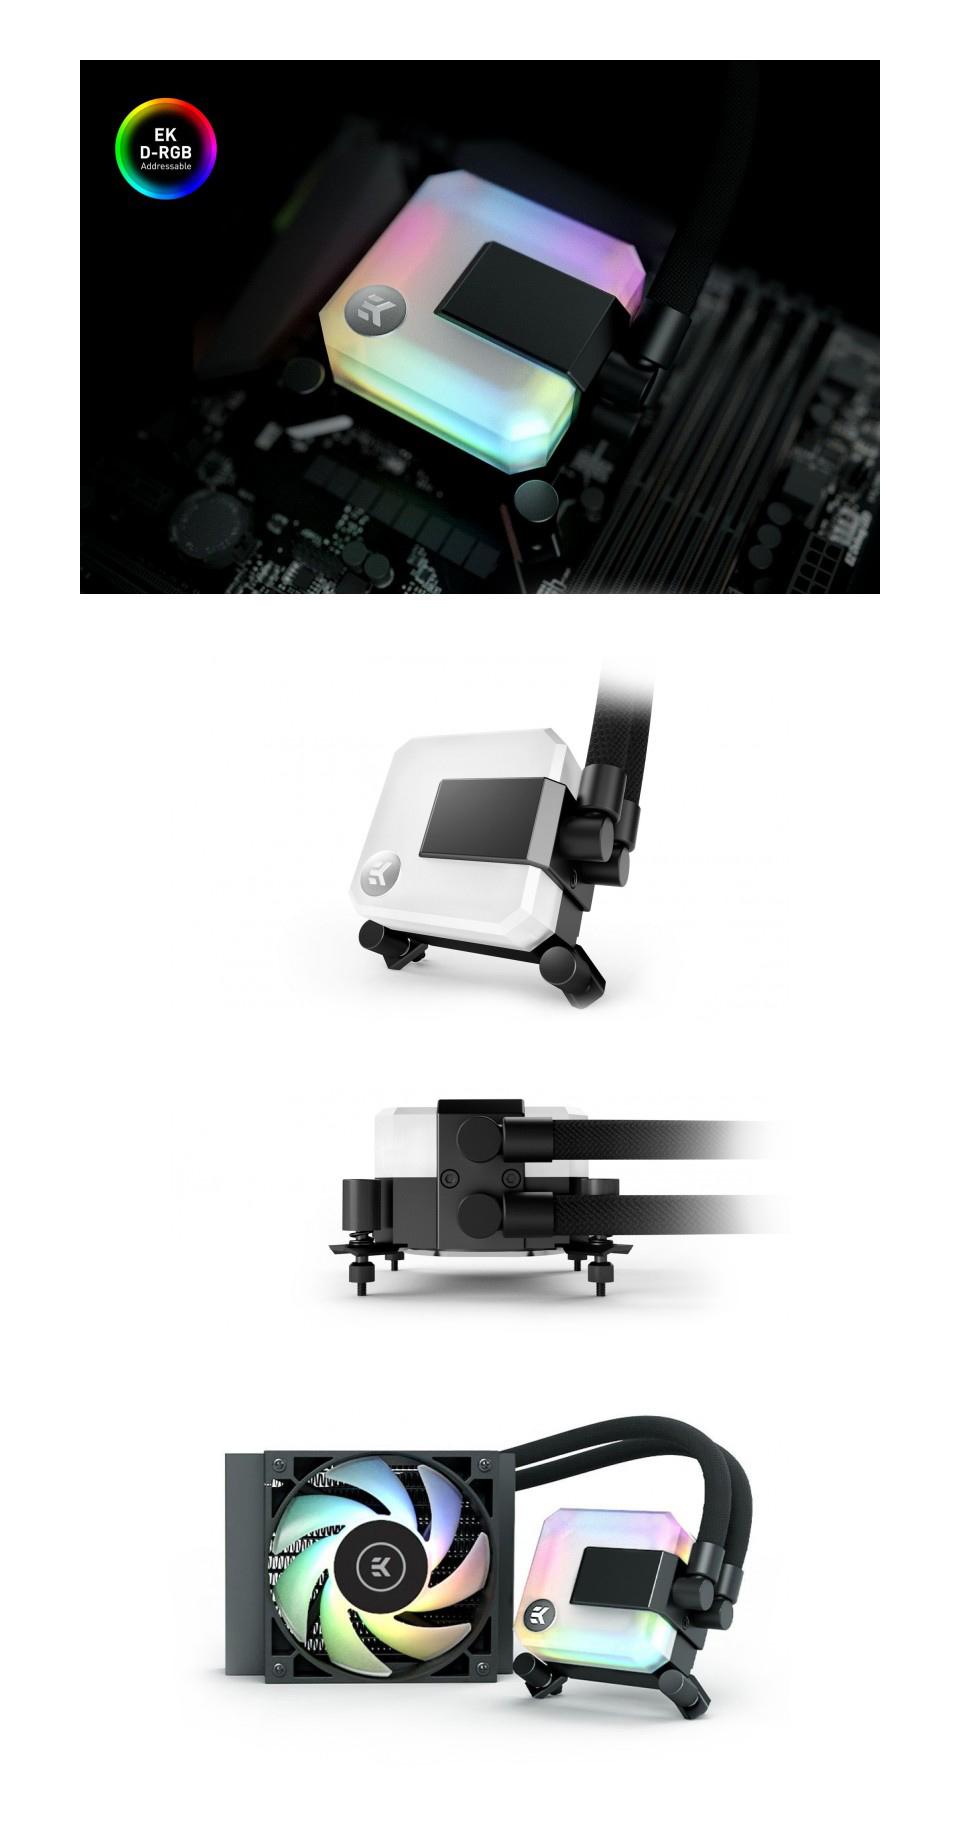 EK Waterblocks AIO Liquid CPU Cooler 120mm D-RGB product